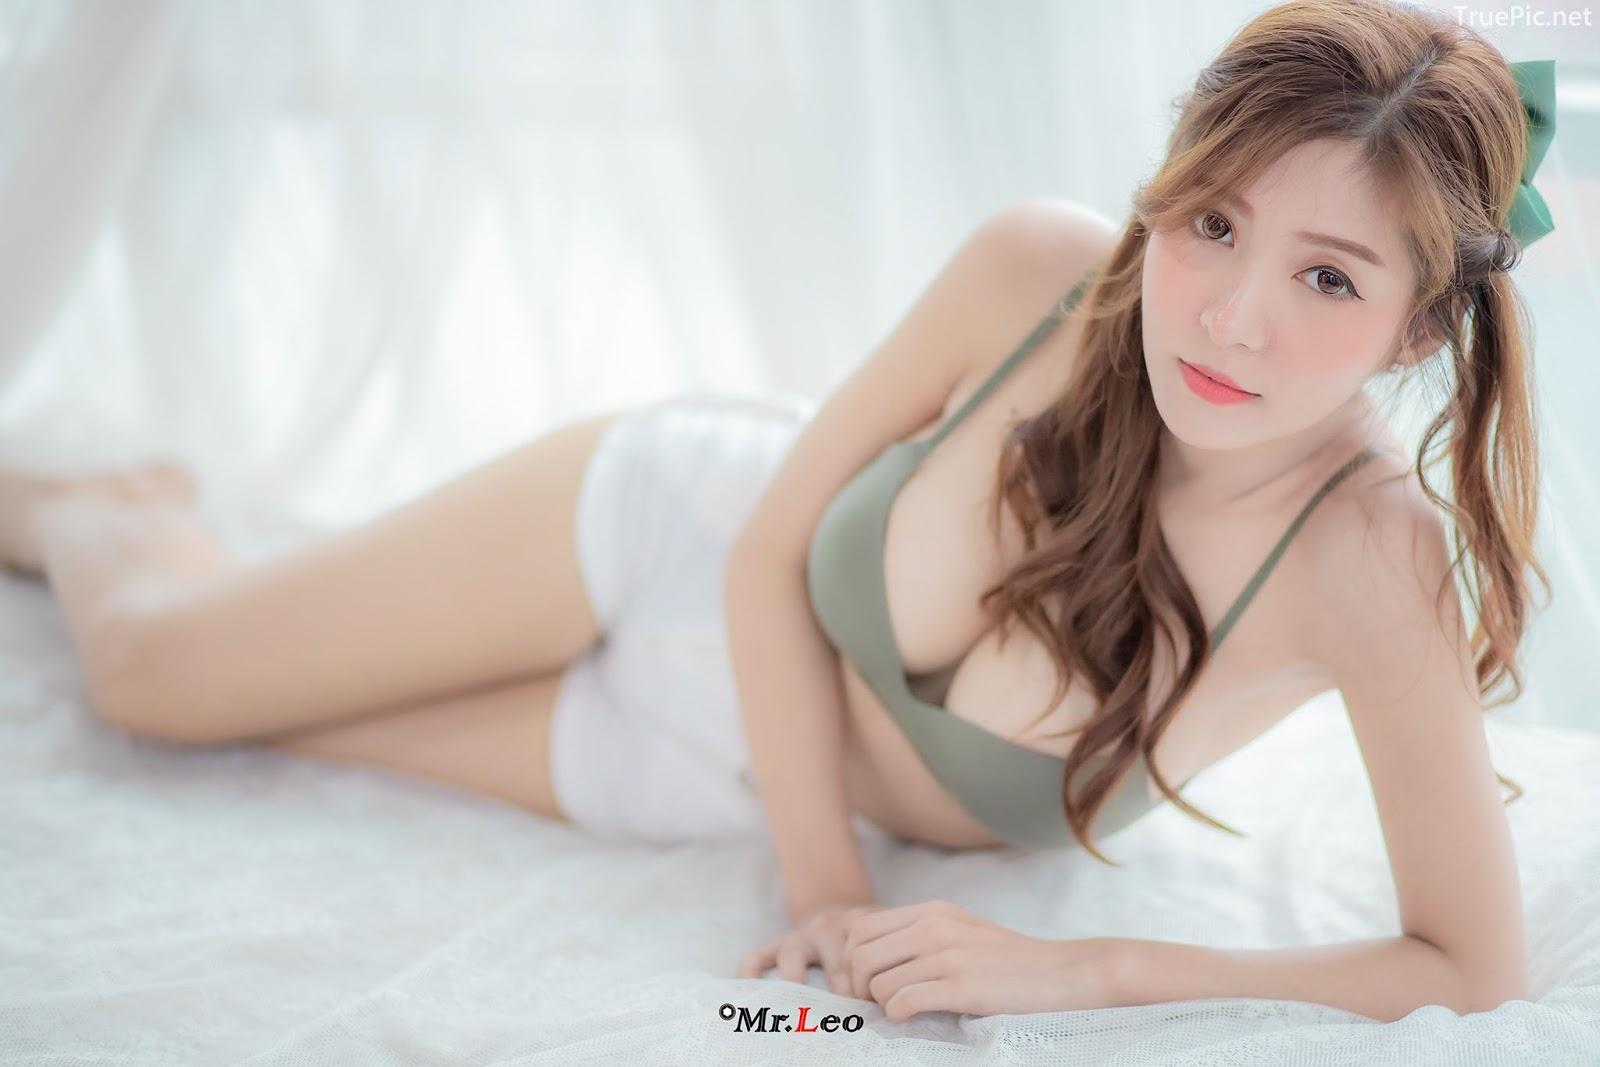 Thailand hot model - Chompoo Radadao Keawla-ied - You're always my good dream - TruePic.net - Picture 4